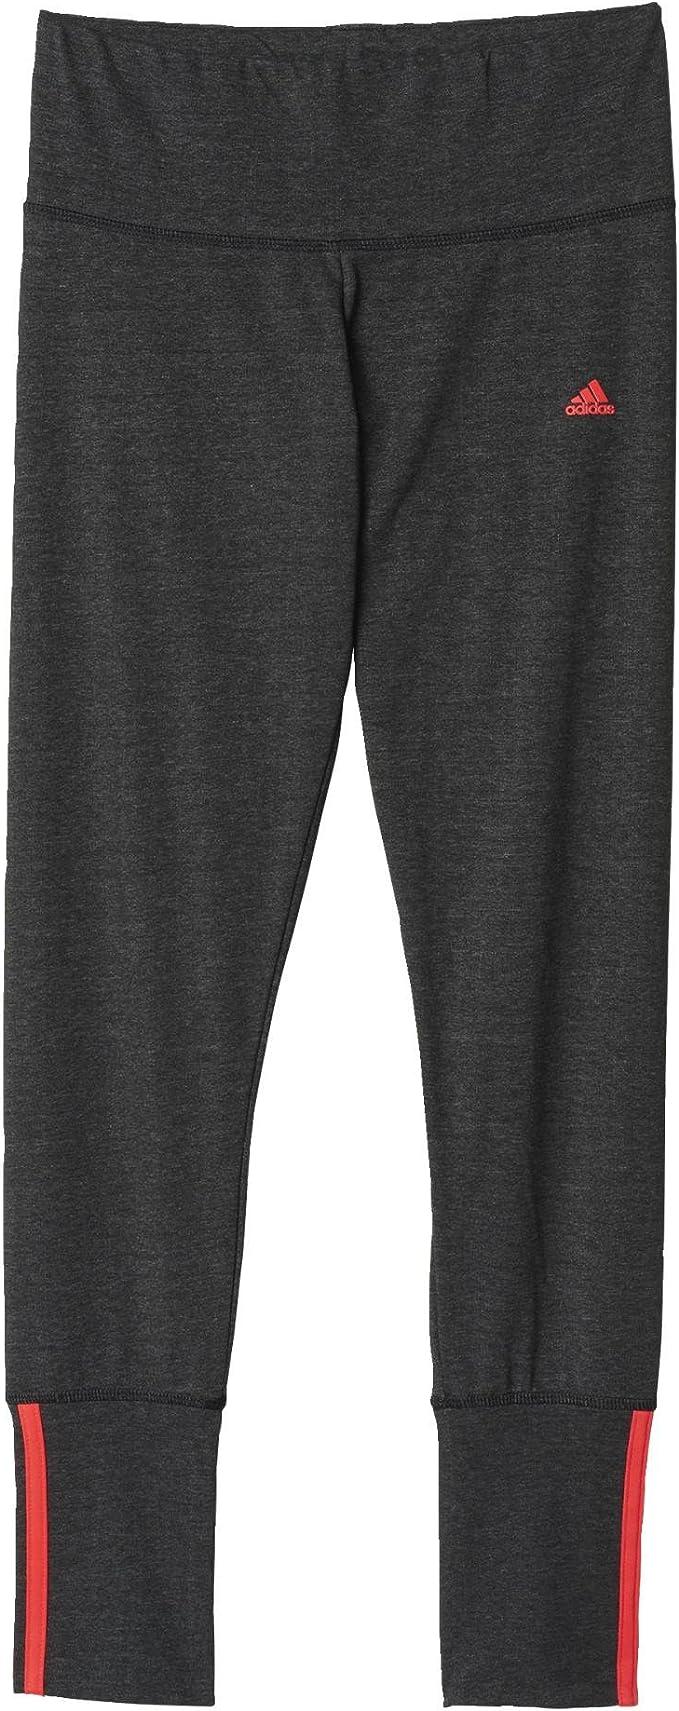 adidas Damen Hose Essentials Mid 3 Stripes Long Tights